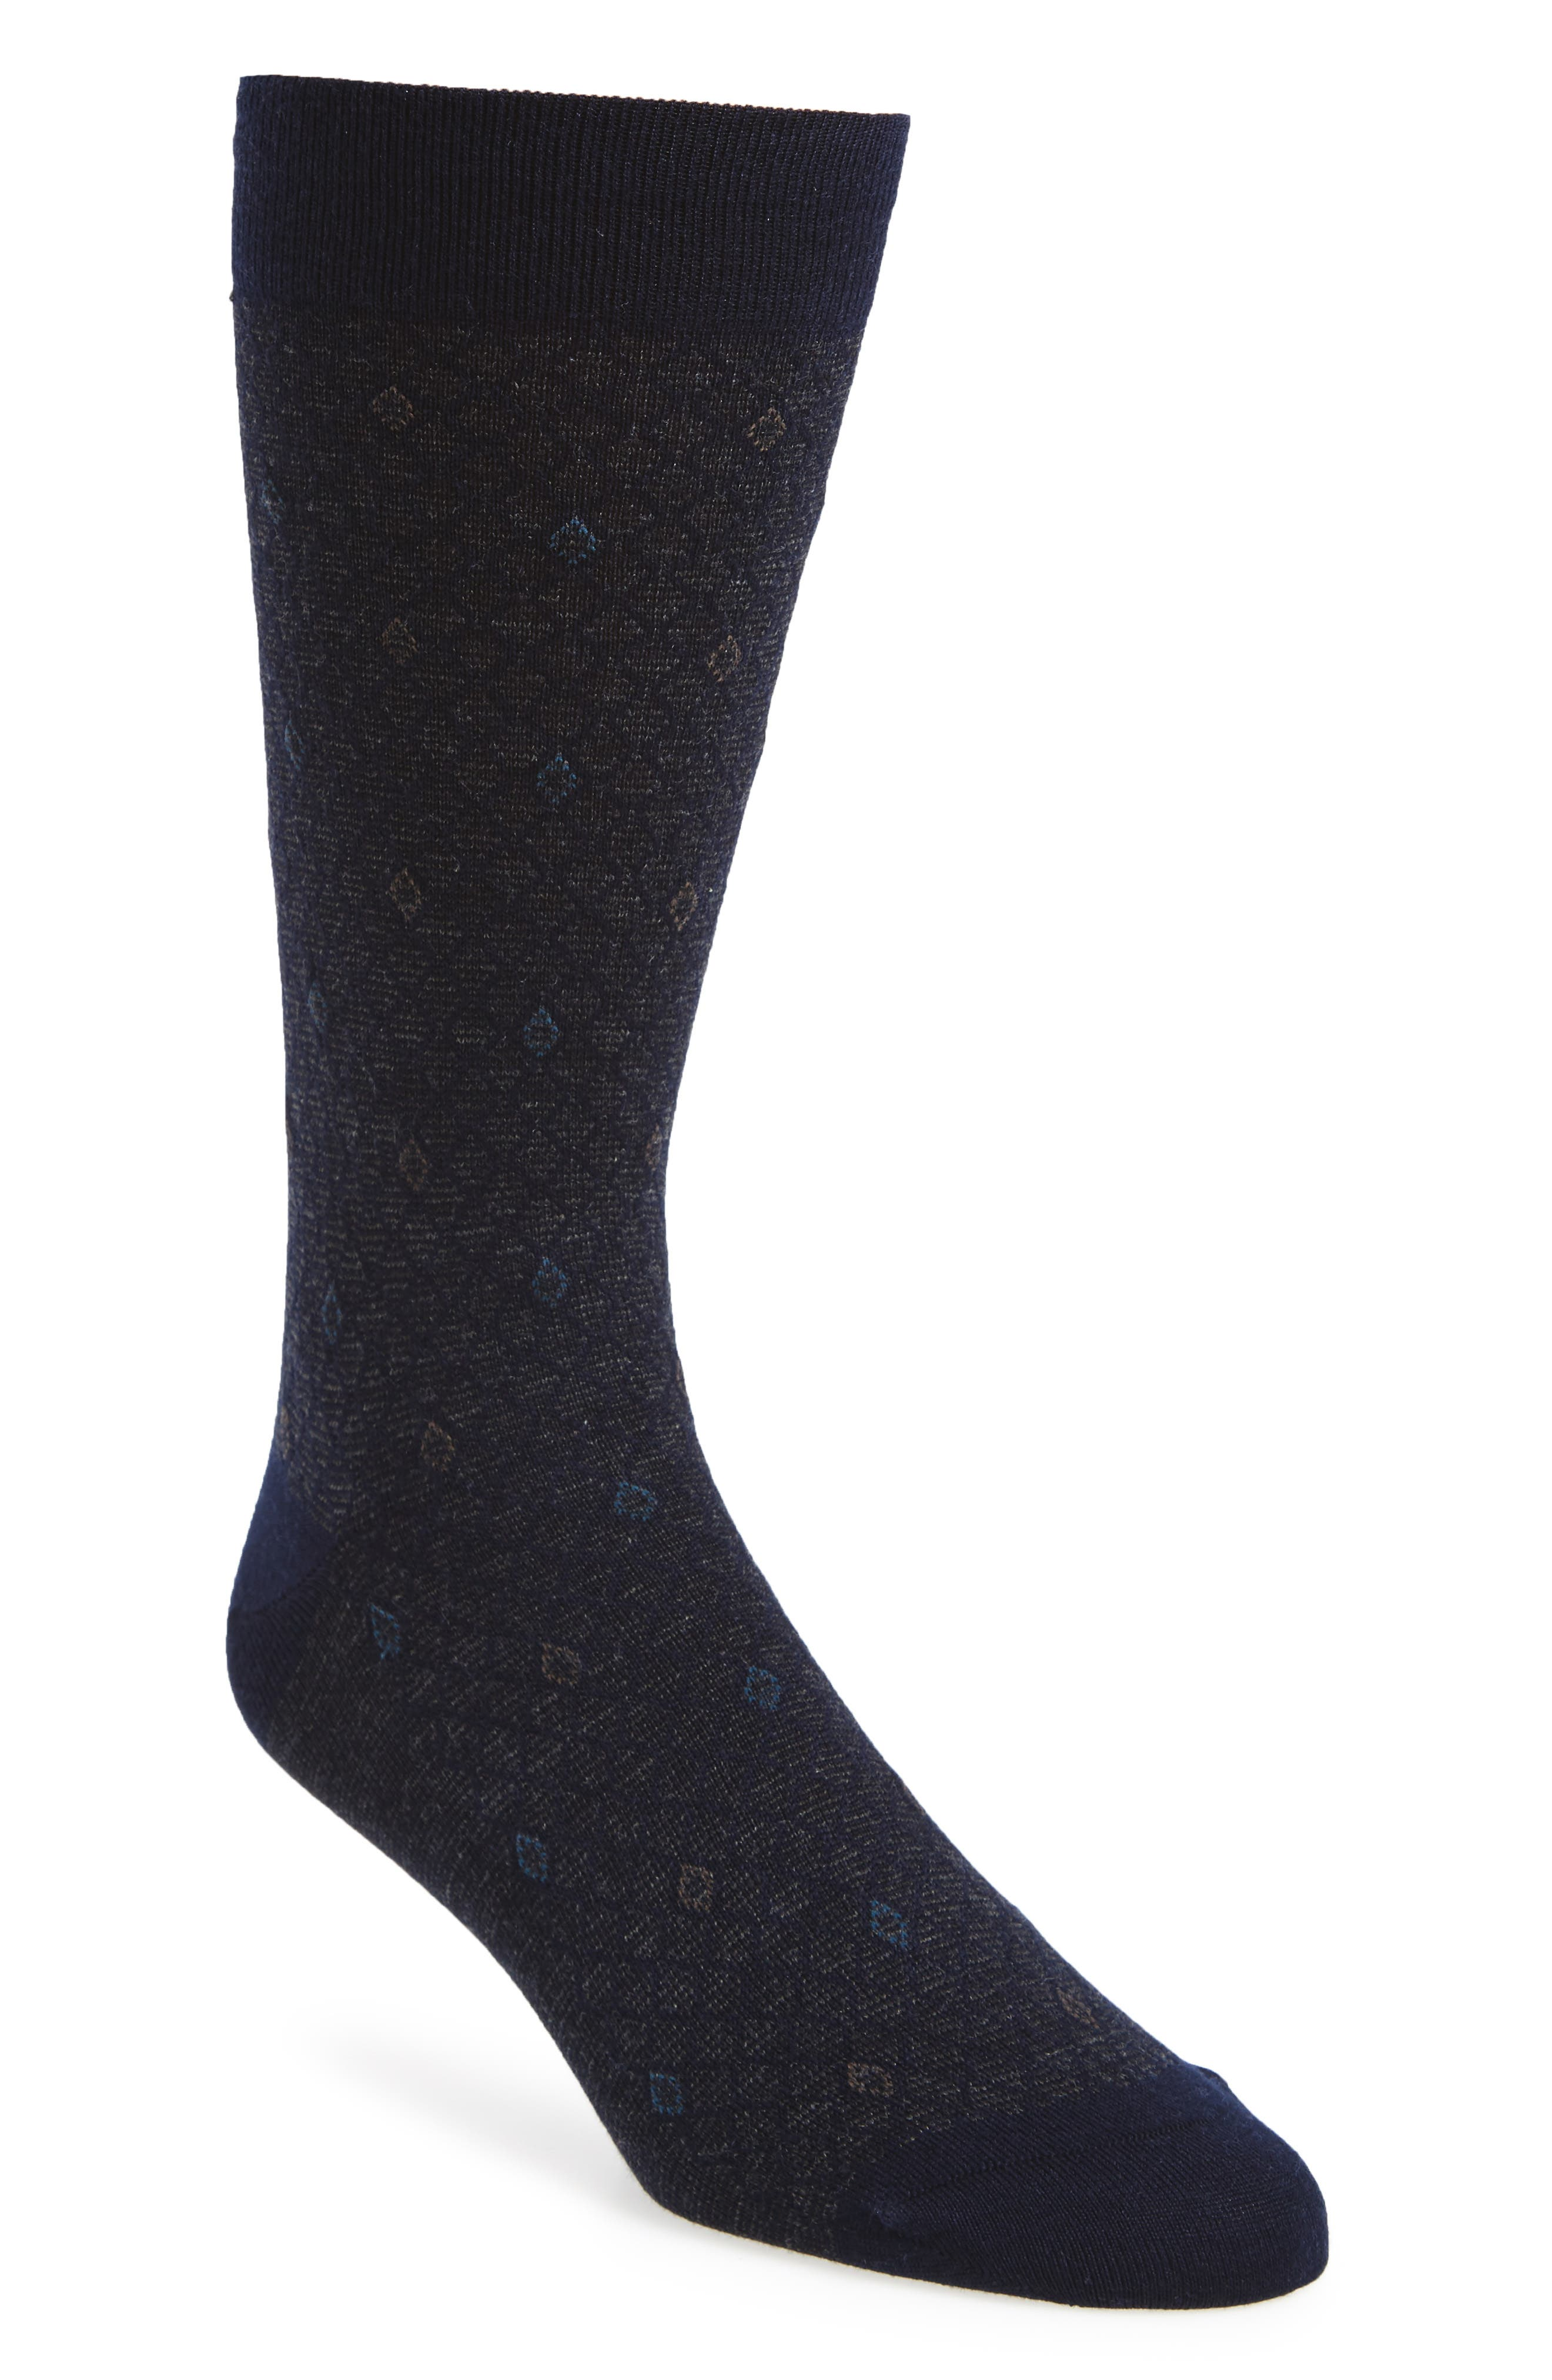 Diamond Wool Blend Socks,                         Main,                         color, Navy